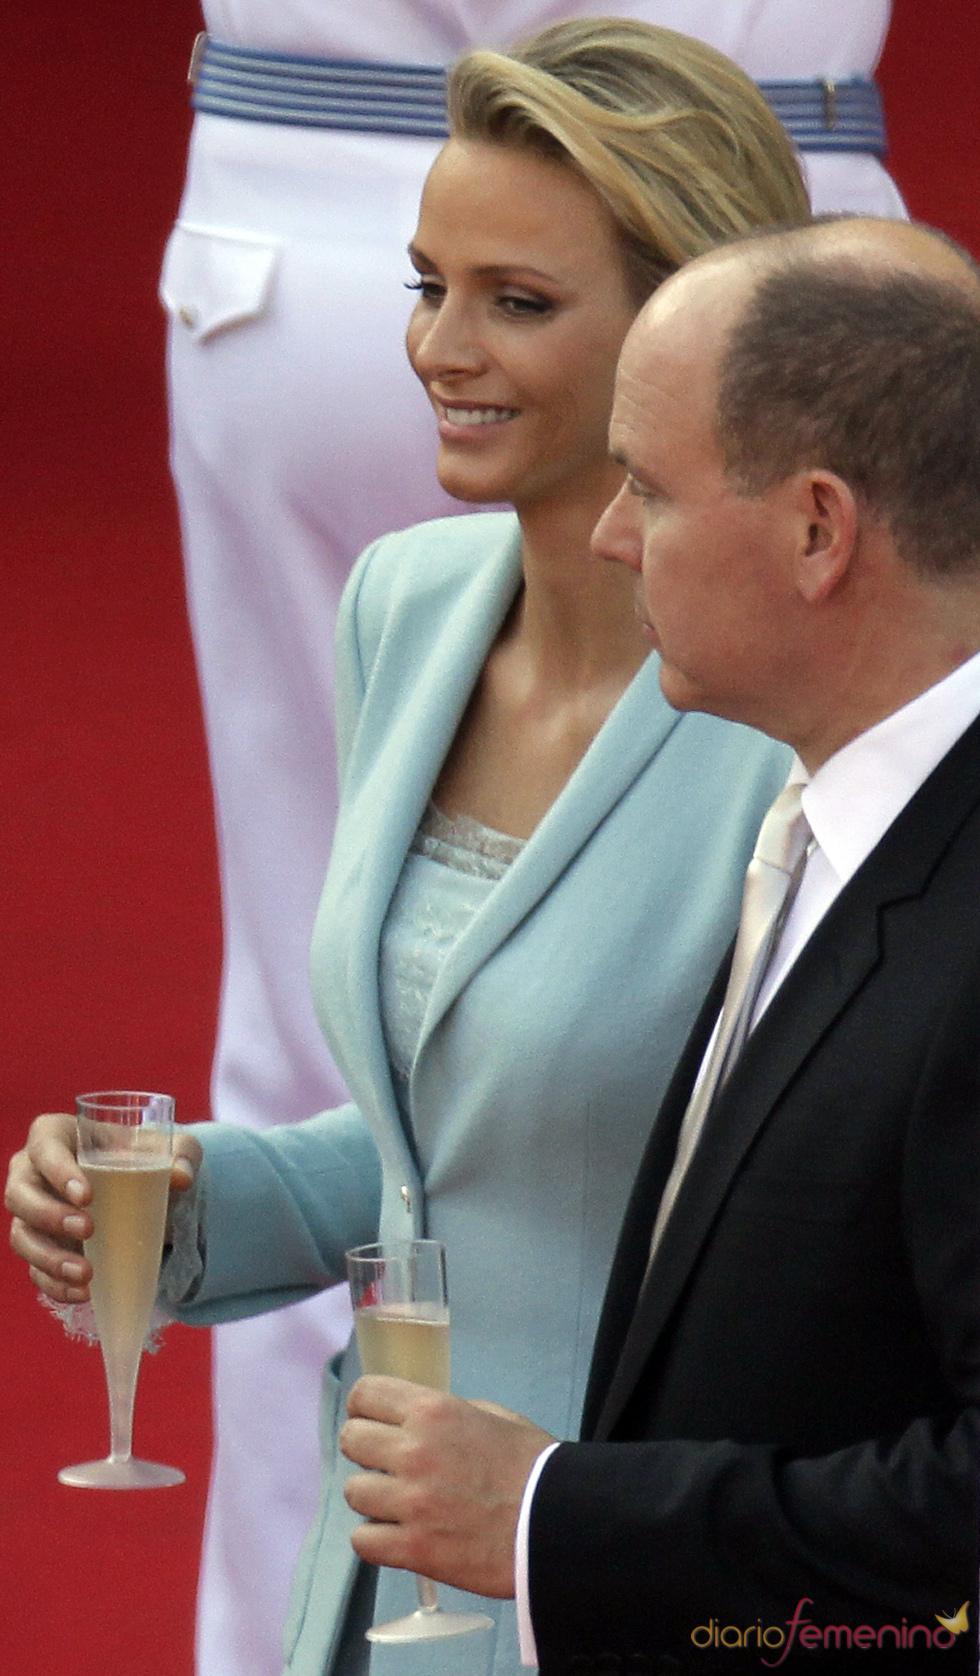 Charlene Wittstock y Alberto de Mónaco brindan tras la ceremonia civil de su Boda Real